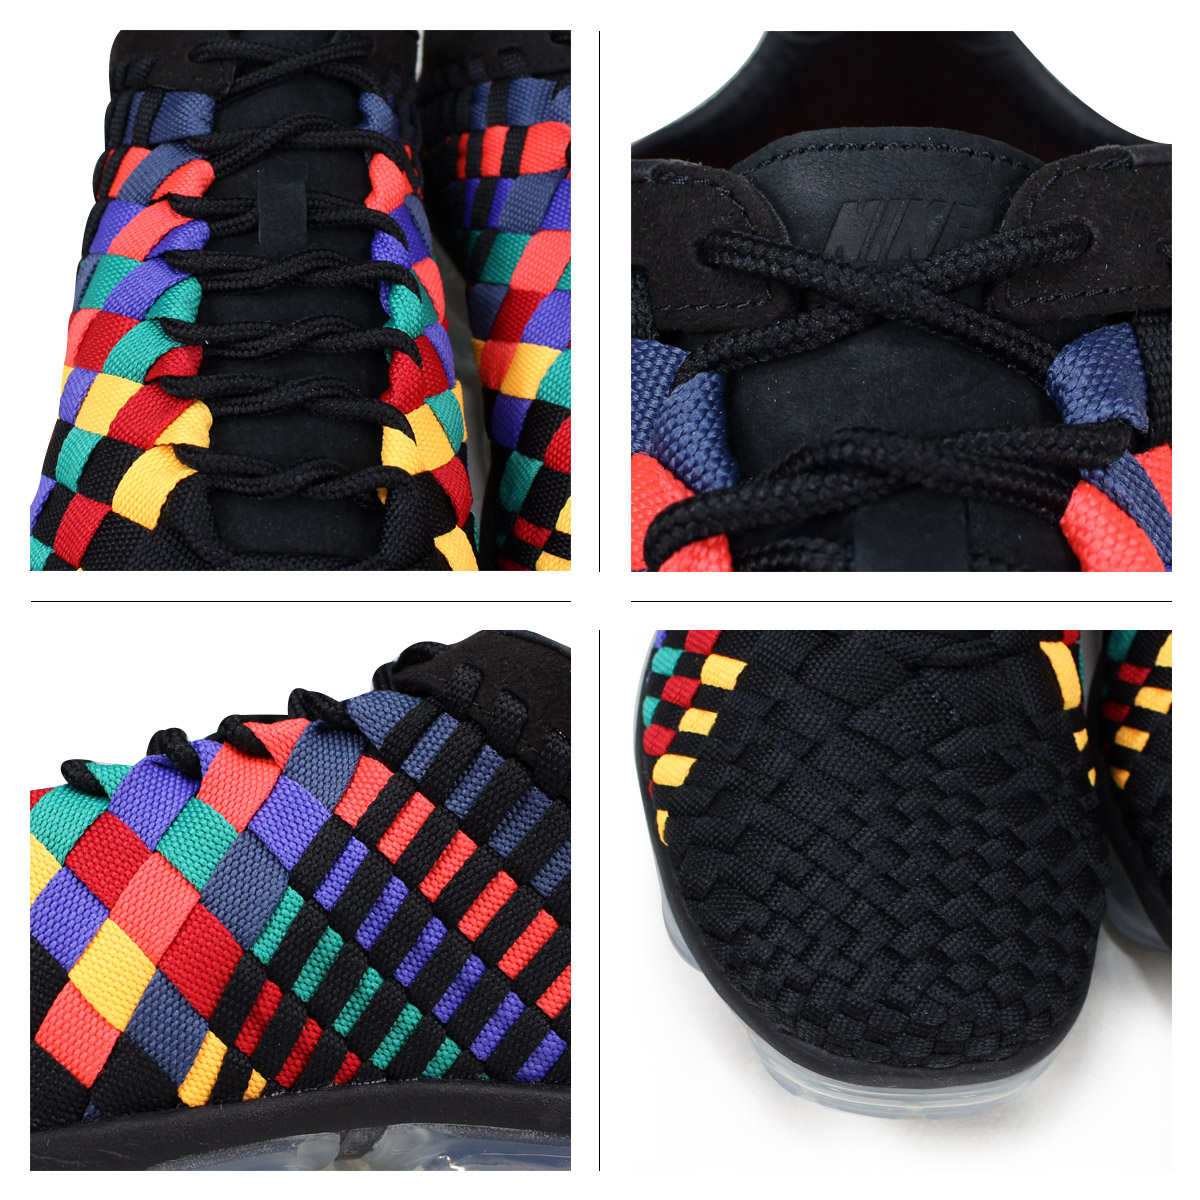 25b36341994 NIKE AIR VAPORMAX INNEVA Nike air vapor max sneakers men AO2447-001 black   6 16 Shinnyu load   186